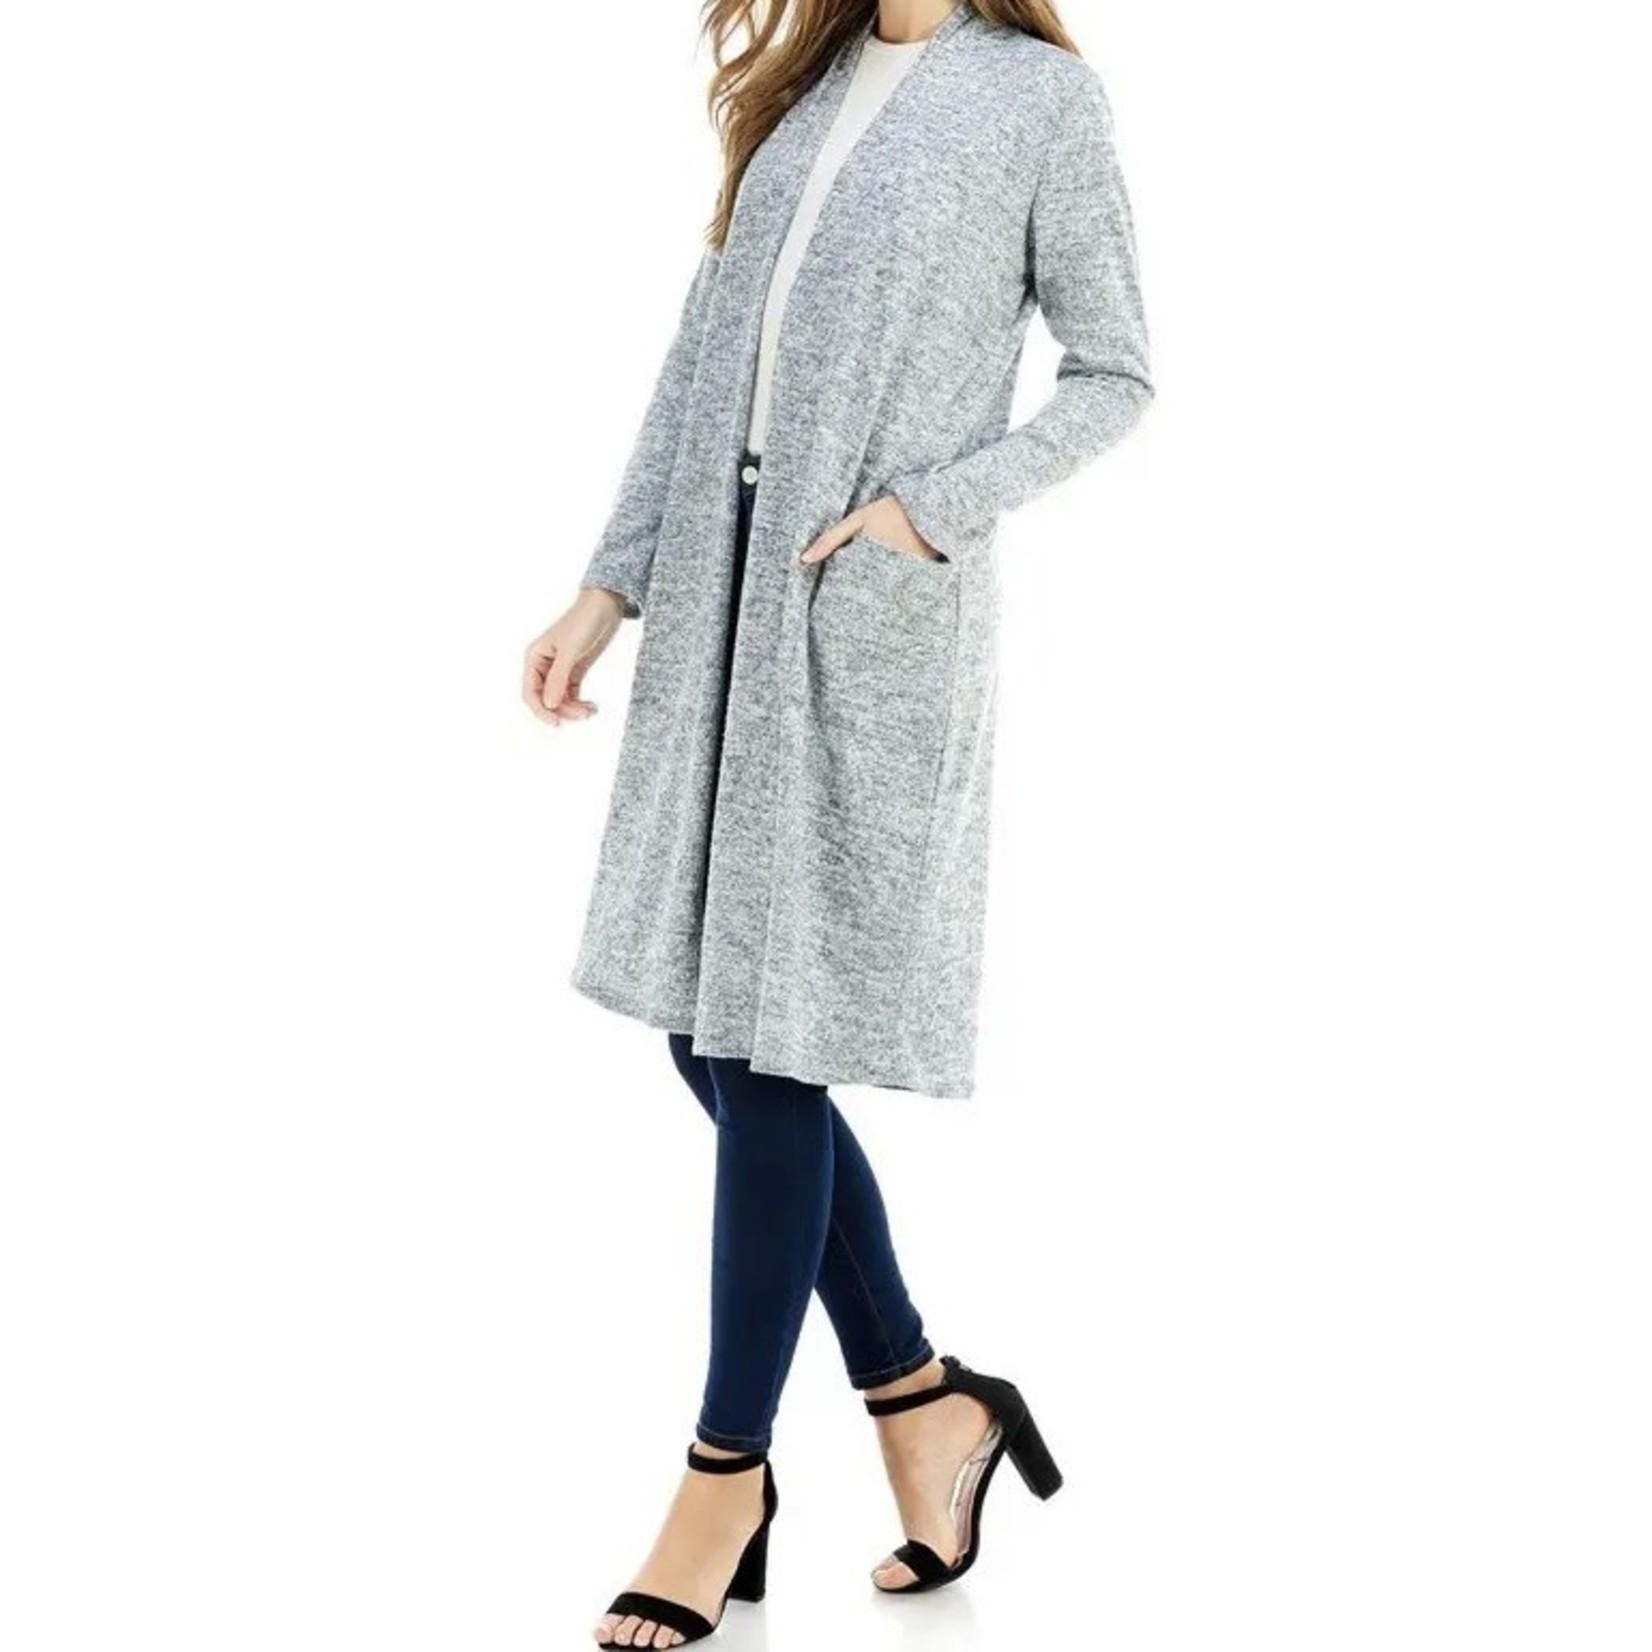 Azules Knitwear: Maxi Long Sleeve Cardigan + Pockets